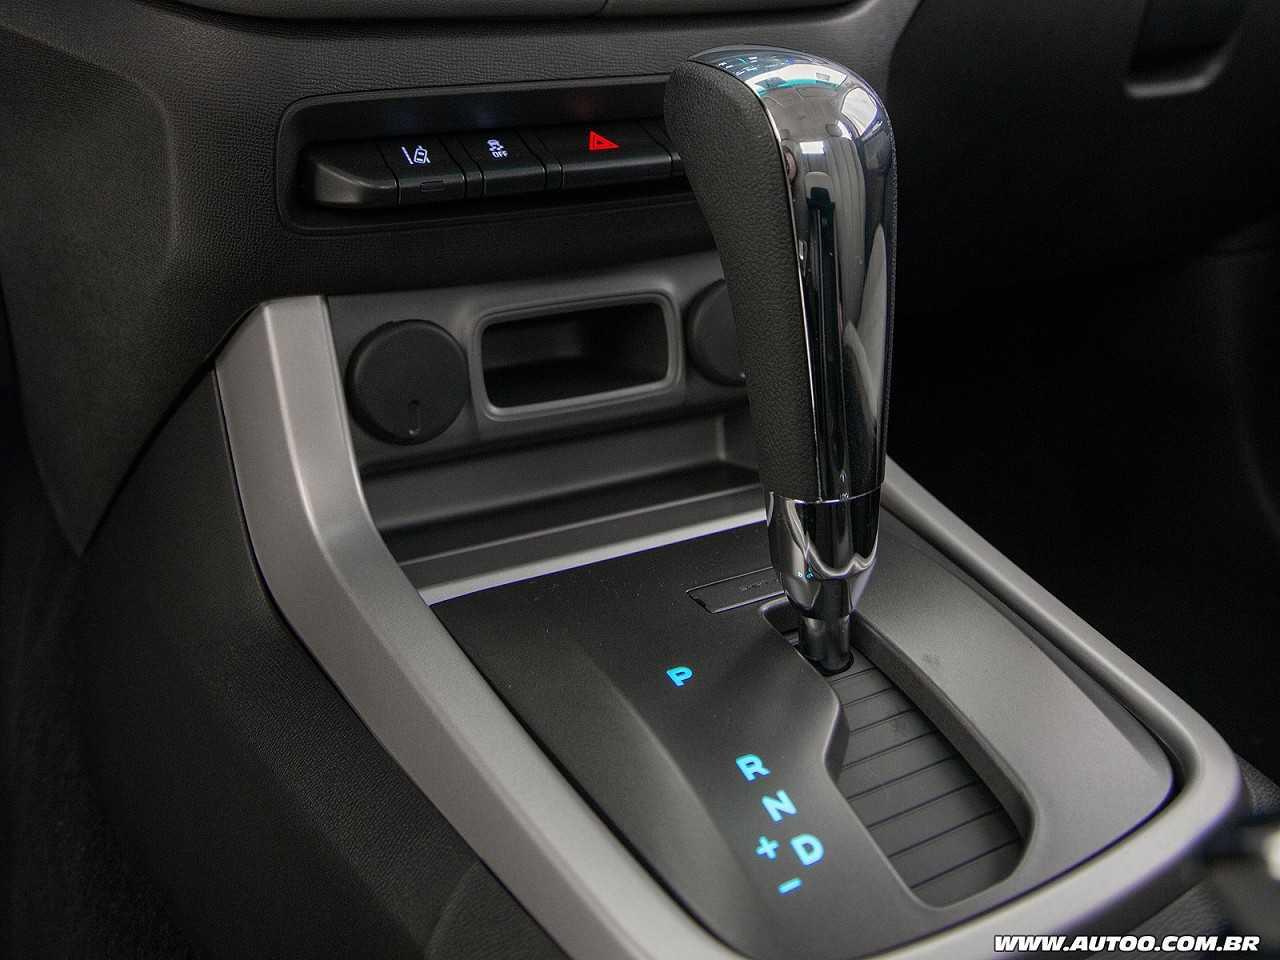 ChevroletS10 2018 - câmbio